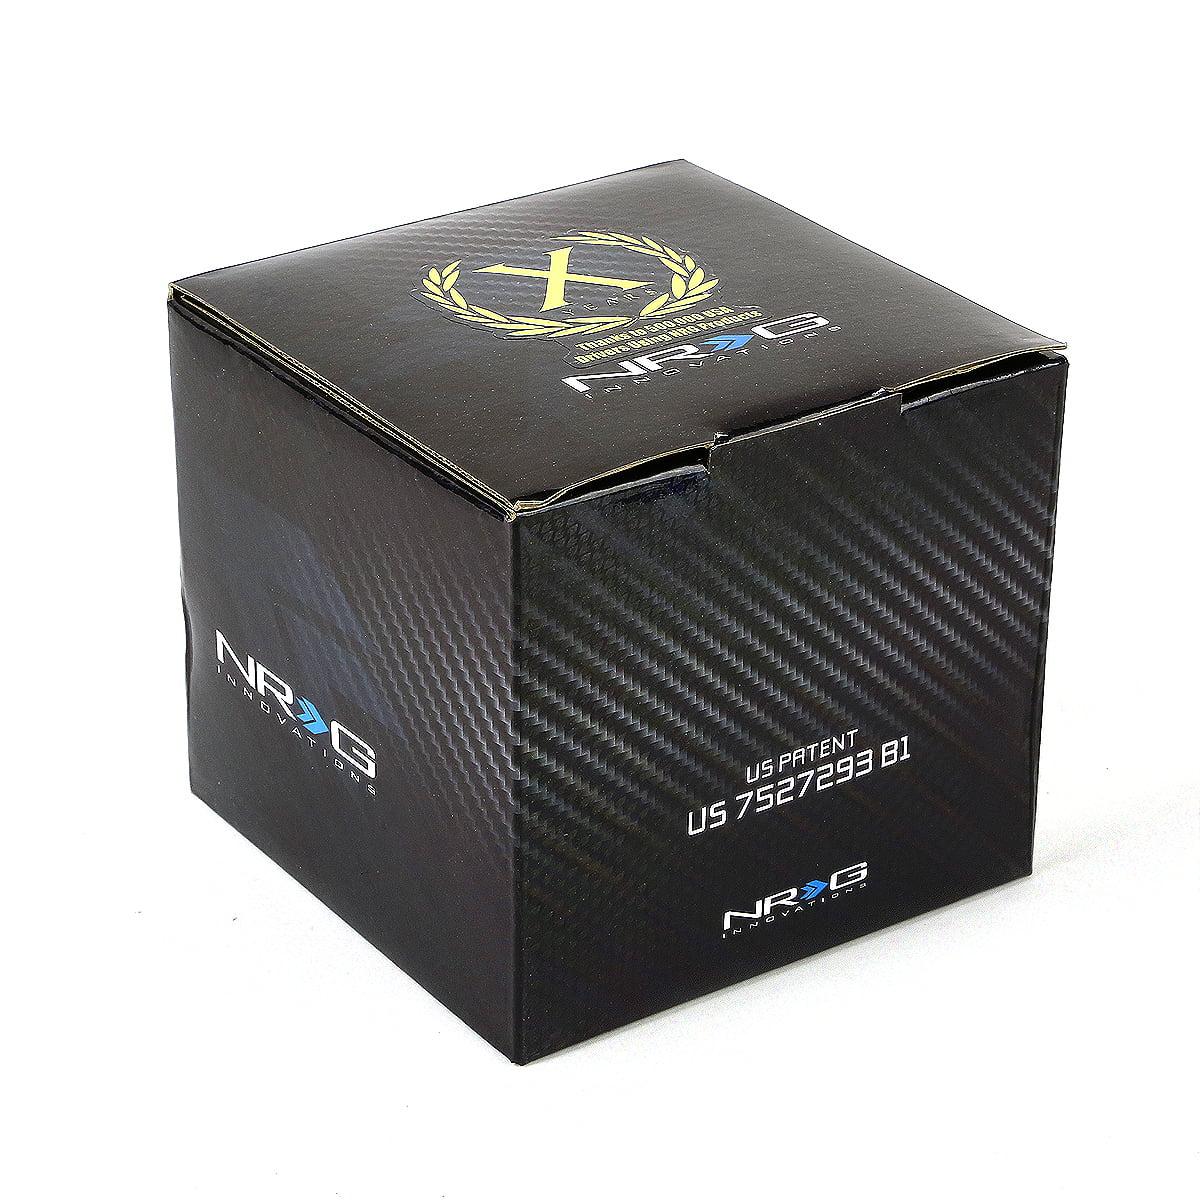 LED Keychain Flashlight NRG Innovations SRK-186H Steering Wheel Short Hub Adapter Kit